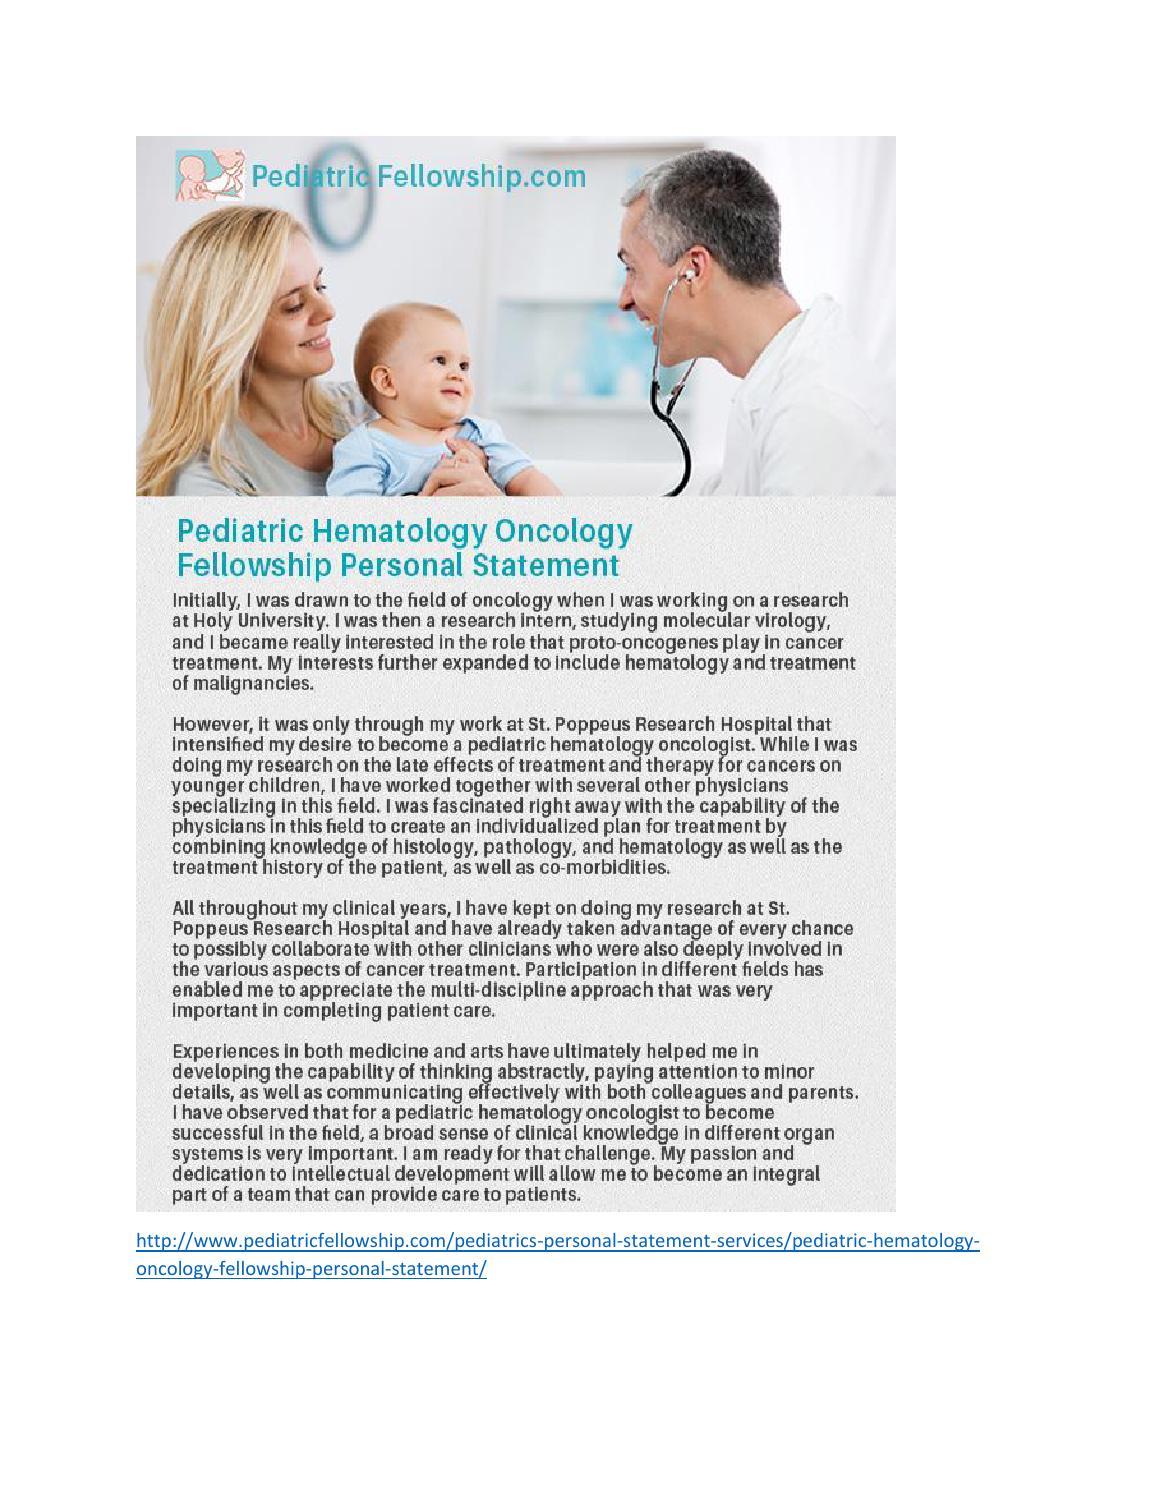 Pediatric Hematology Oncology Fellowship Personal Statement by